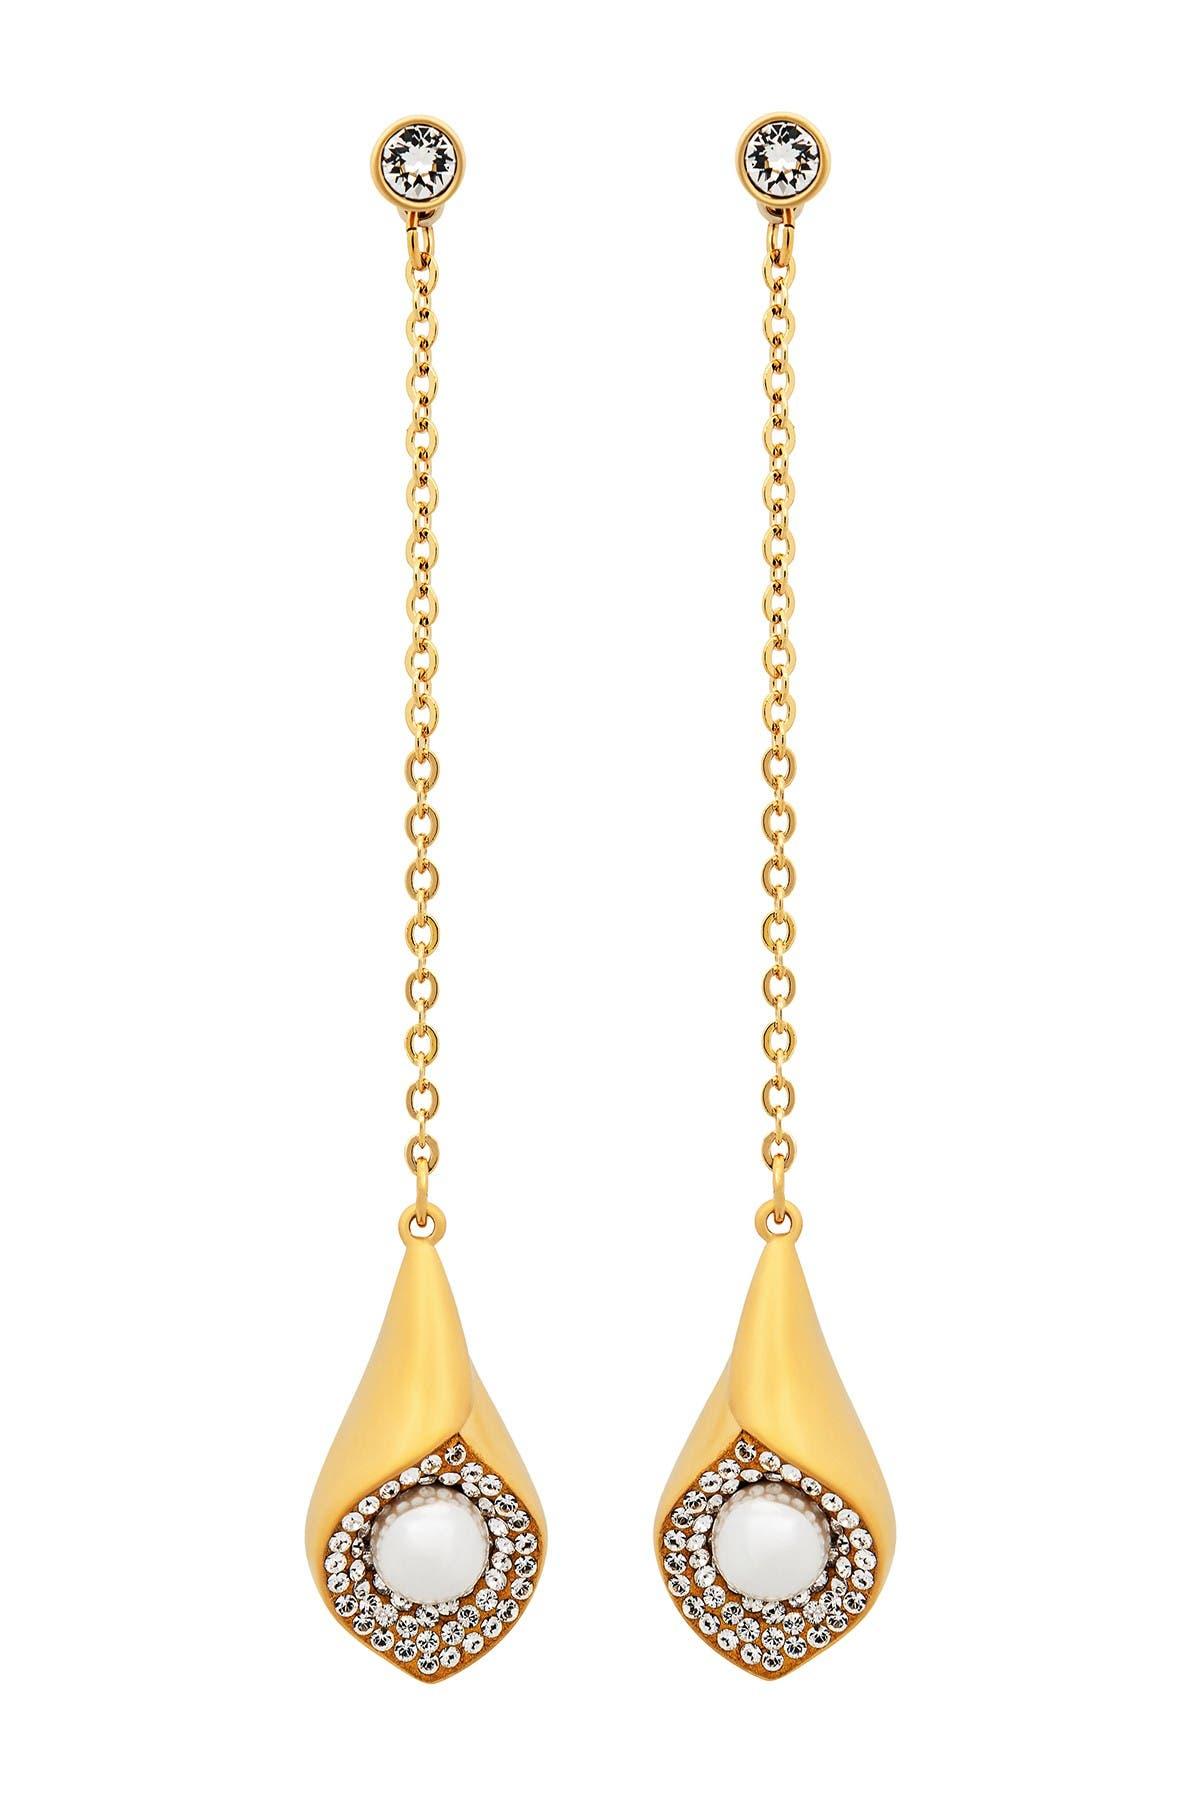 Image of Swarovski Crystal & Imitation Pearl Modest Drop Earrings